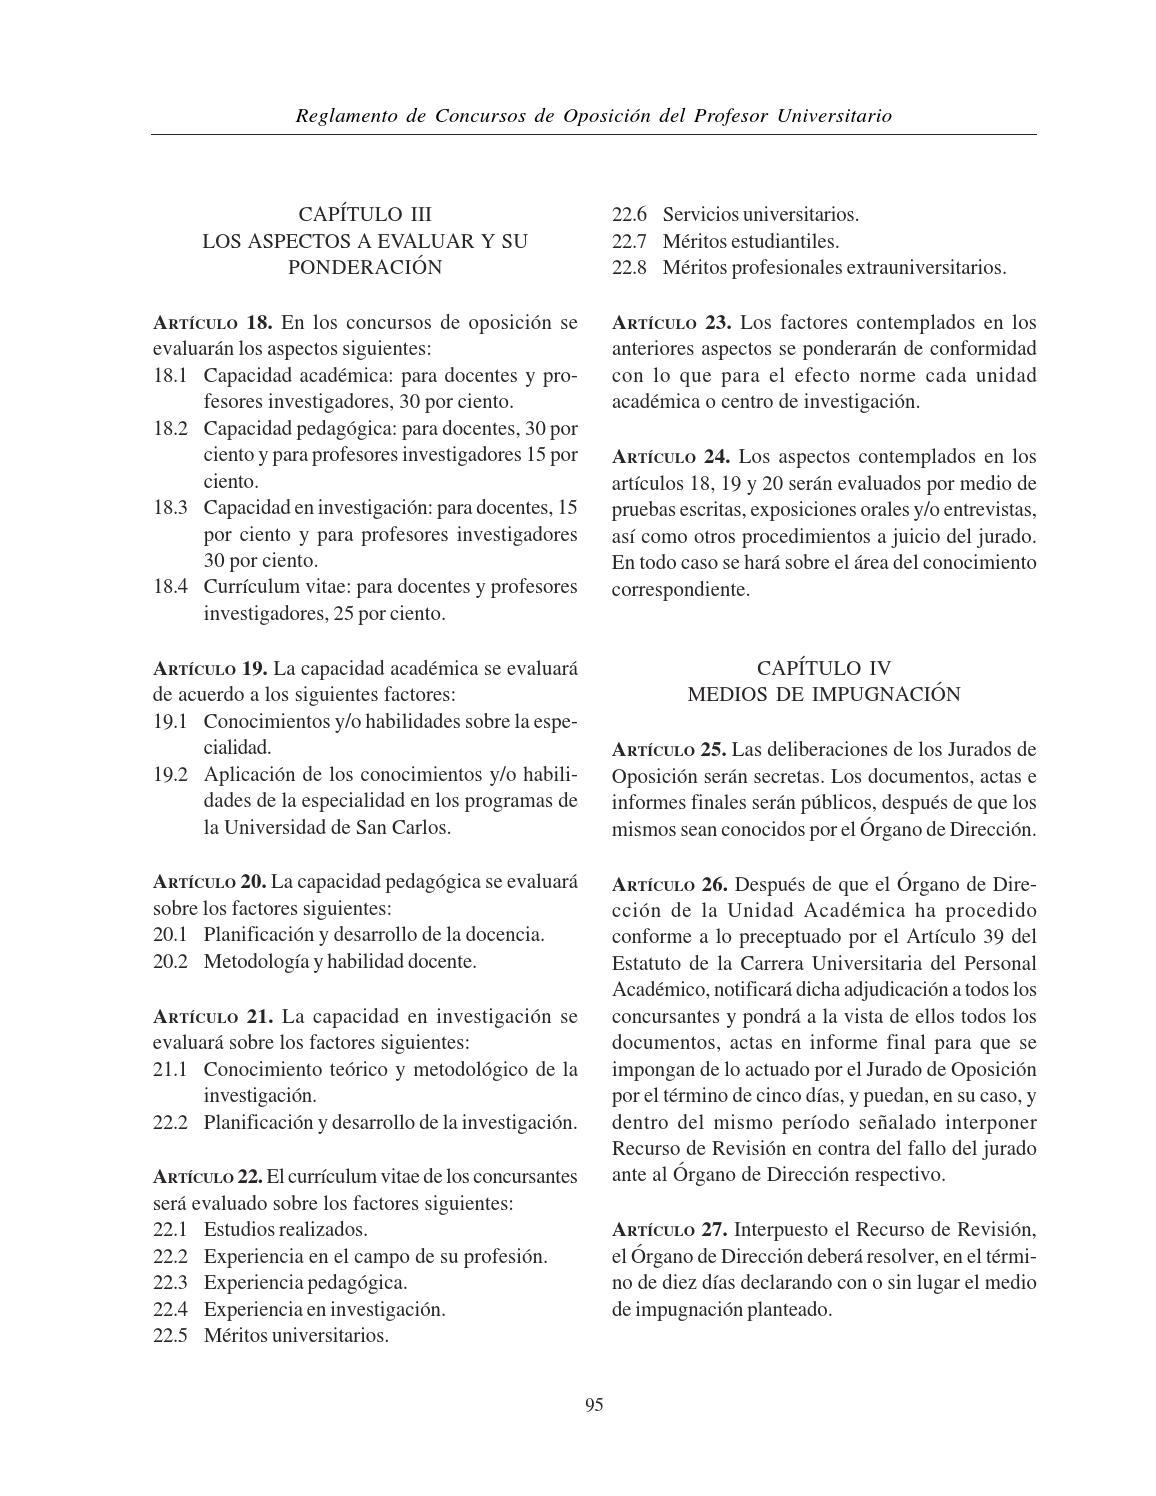 Famoso Curriculum Vitae Modelo Para Docentes Pdf Fotos - Ejemplo De ...